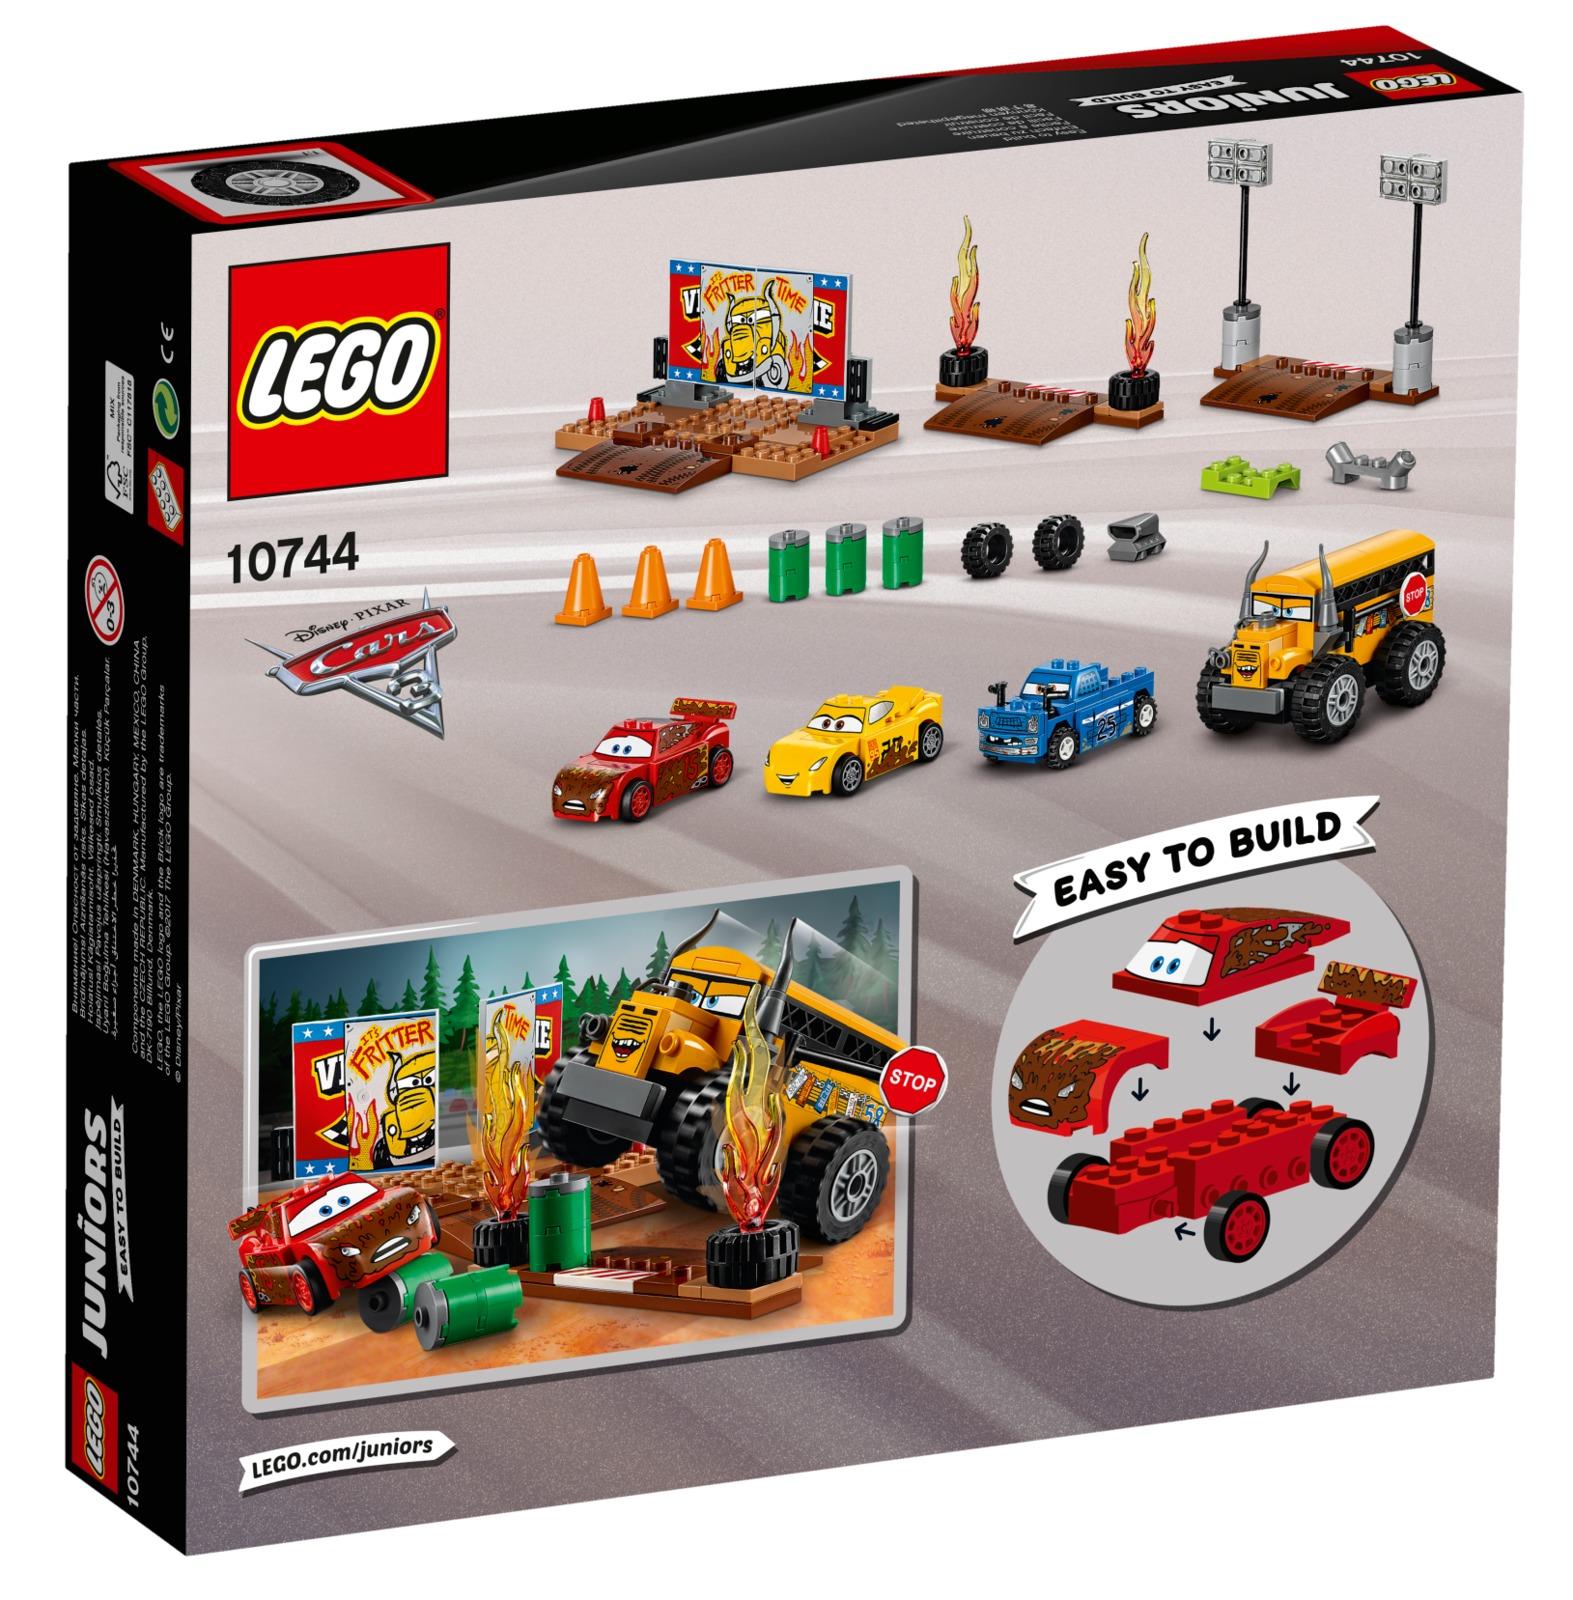 LEGO Juniors - Thunder Hollow Crazy 8 Race (10744) image